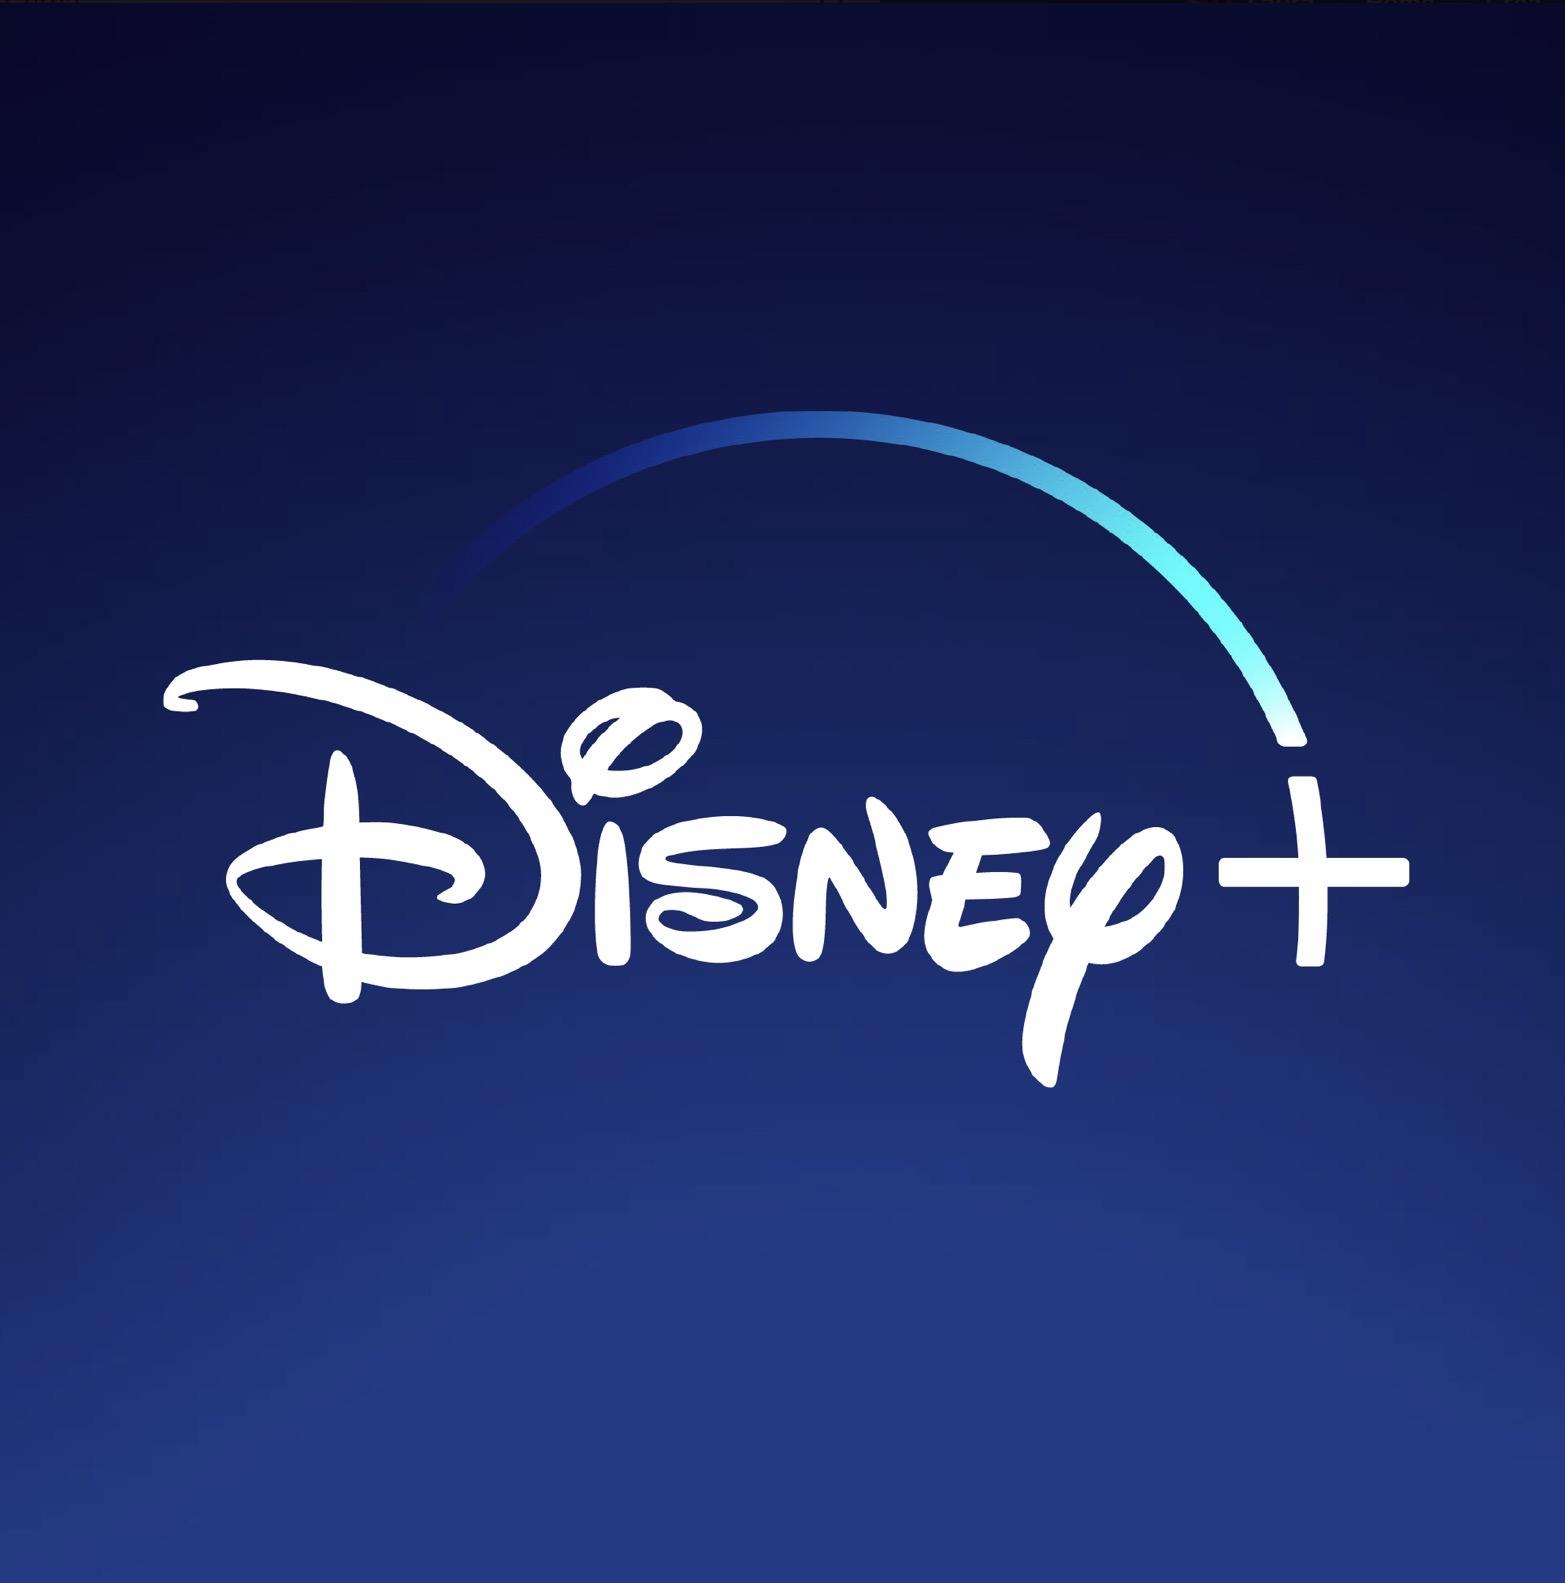 Disney Plus catalogo completo